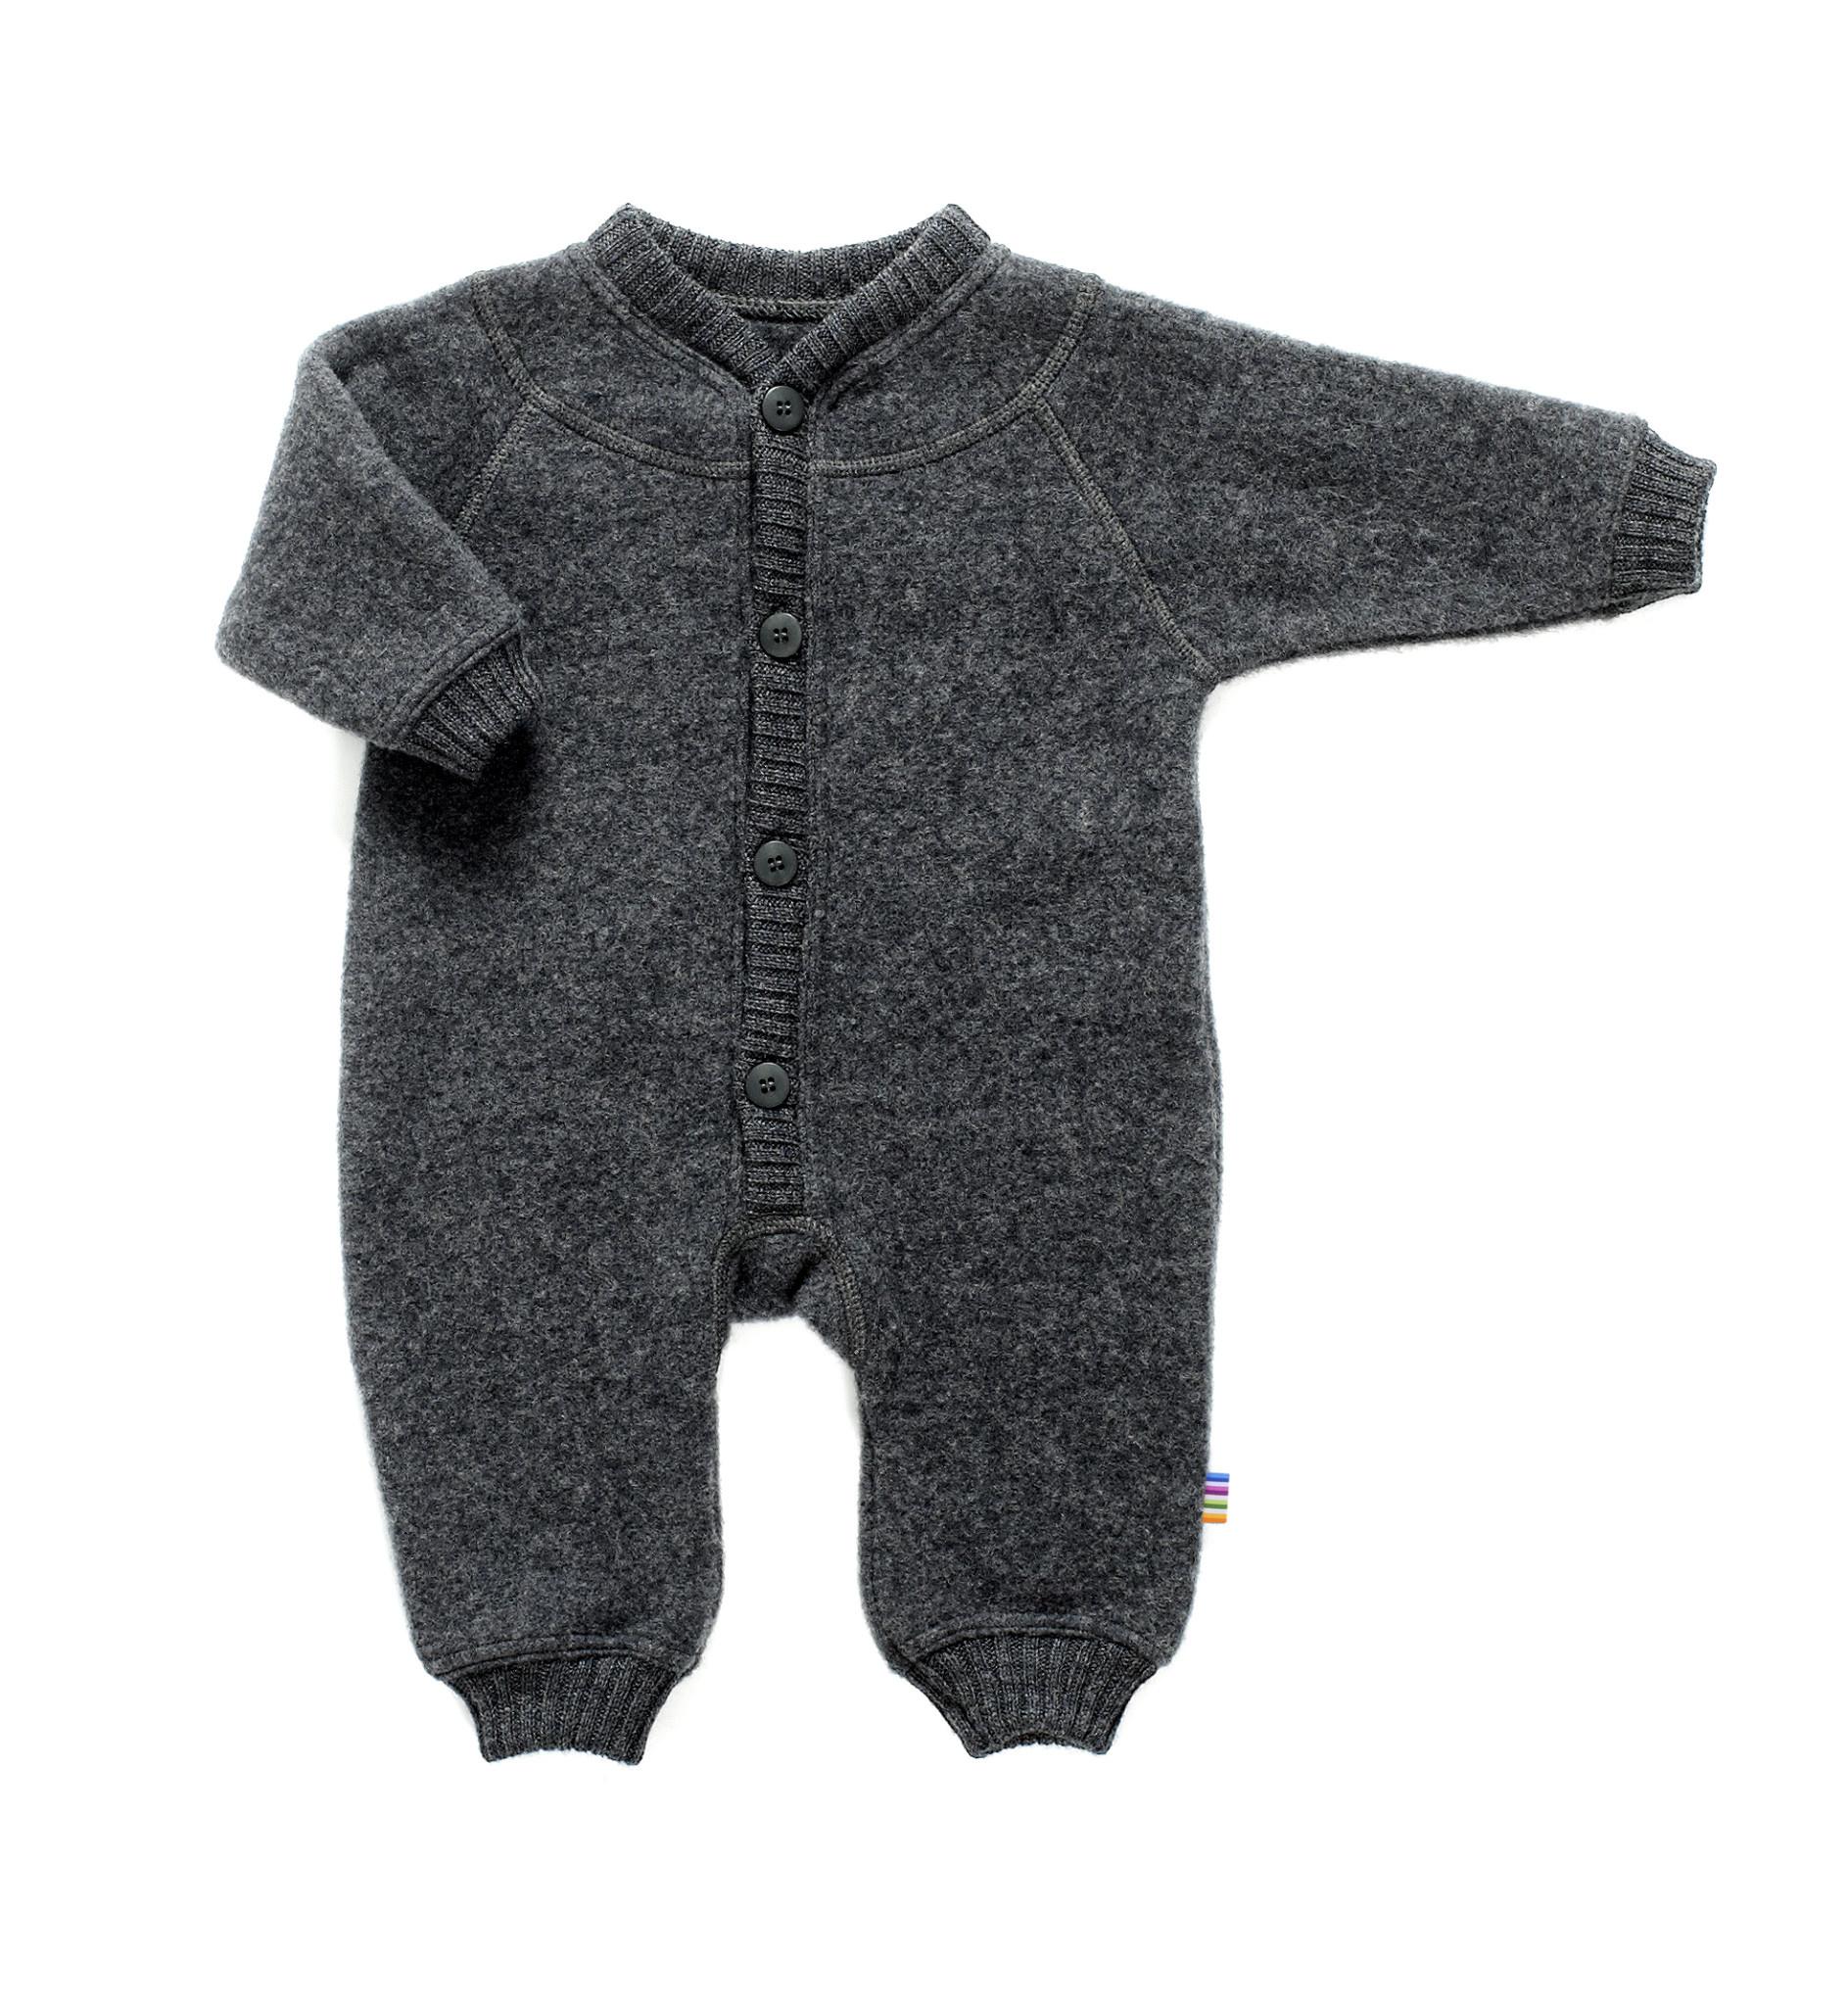 Joha jumpsuit 100% wol - Dark grey melange-1